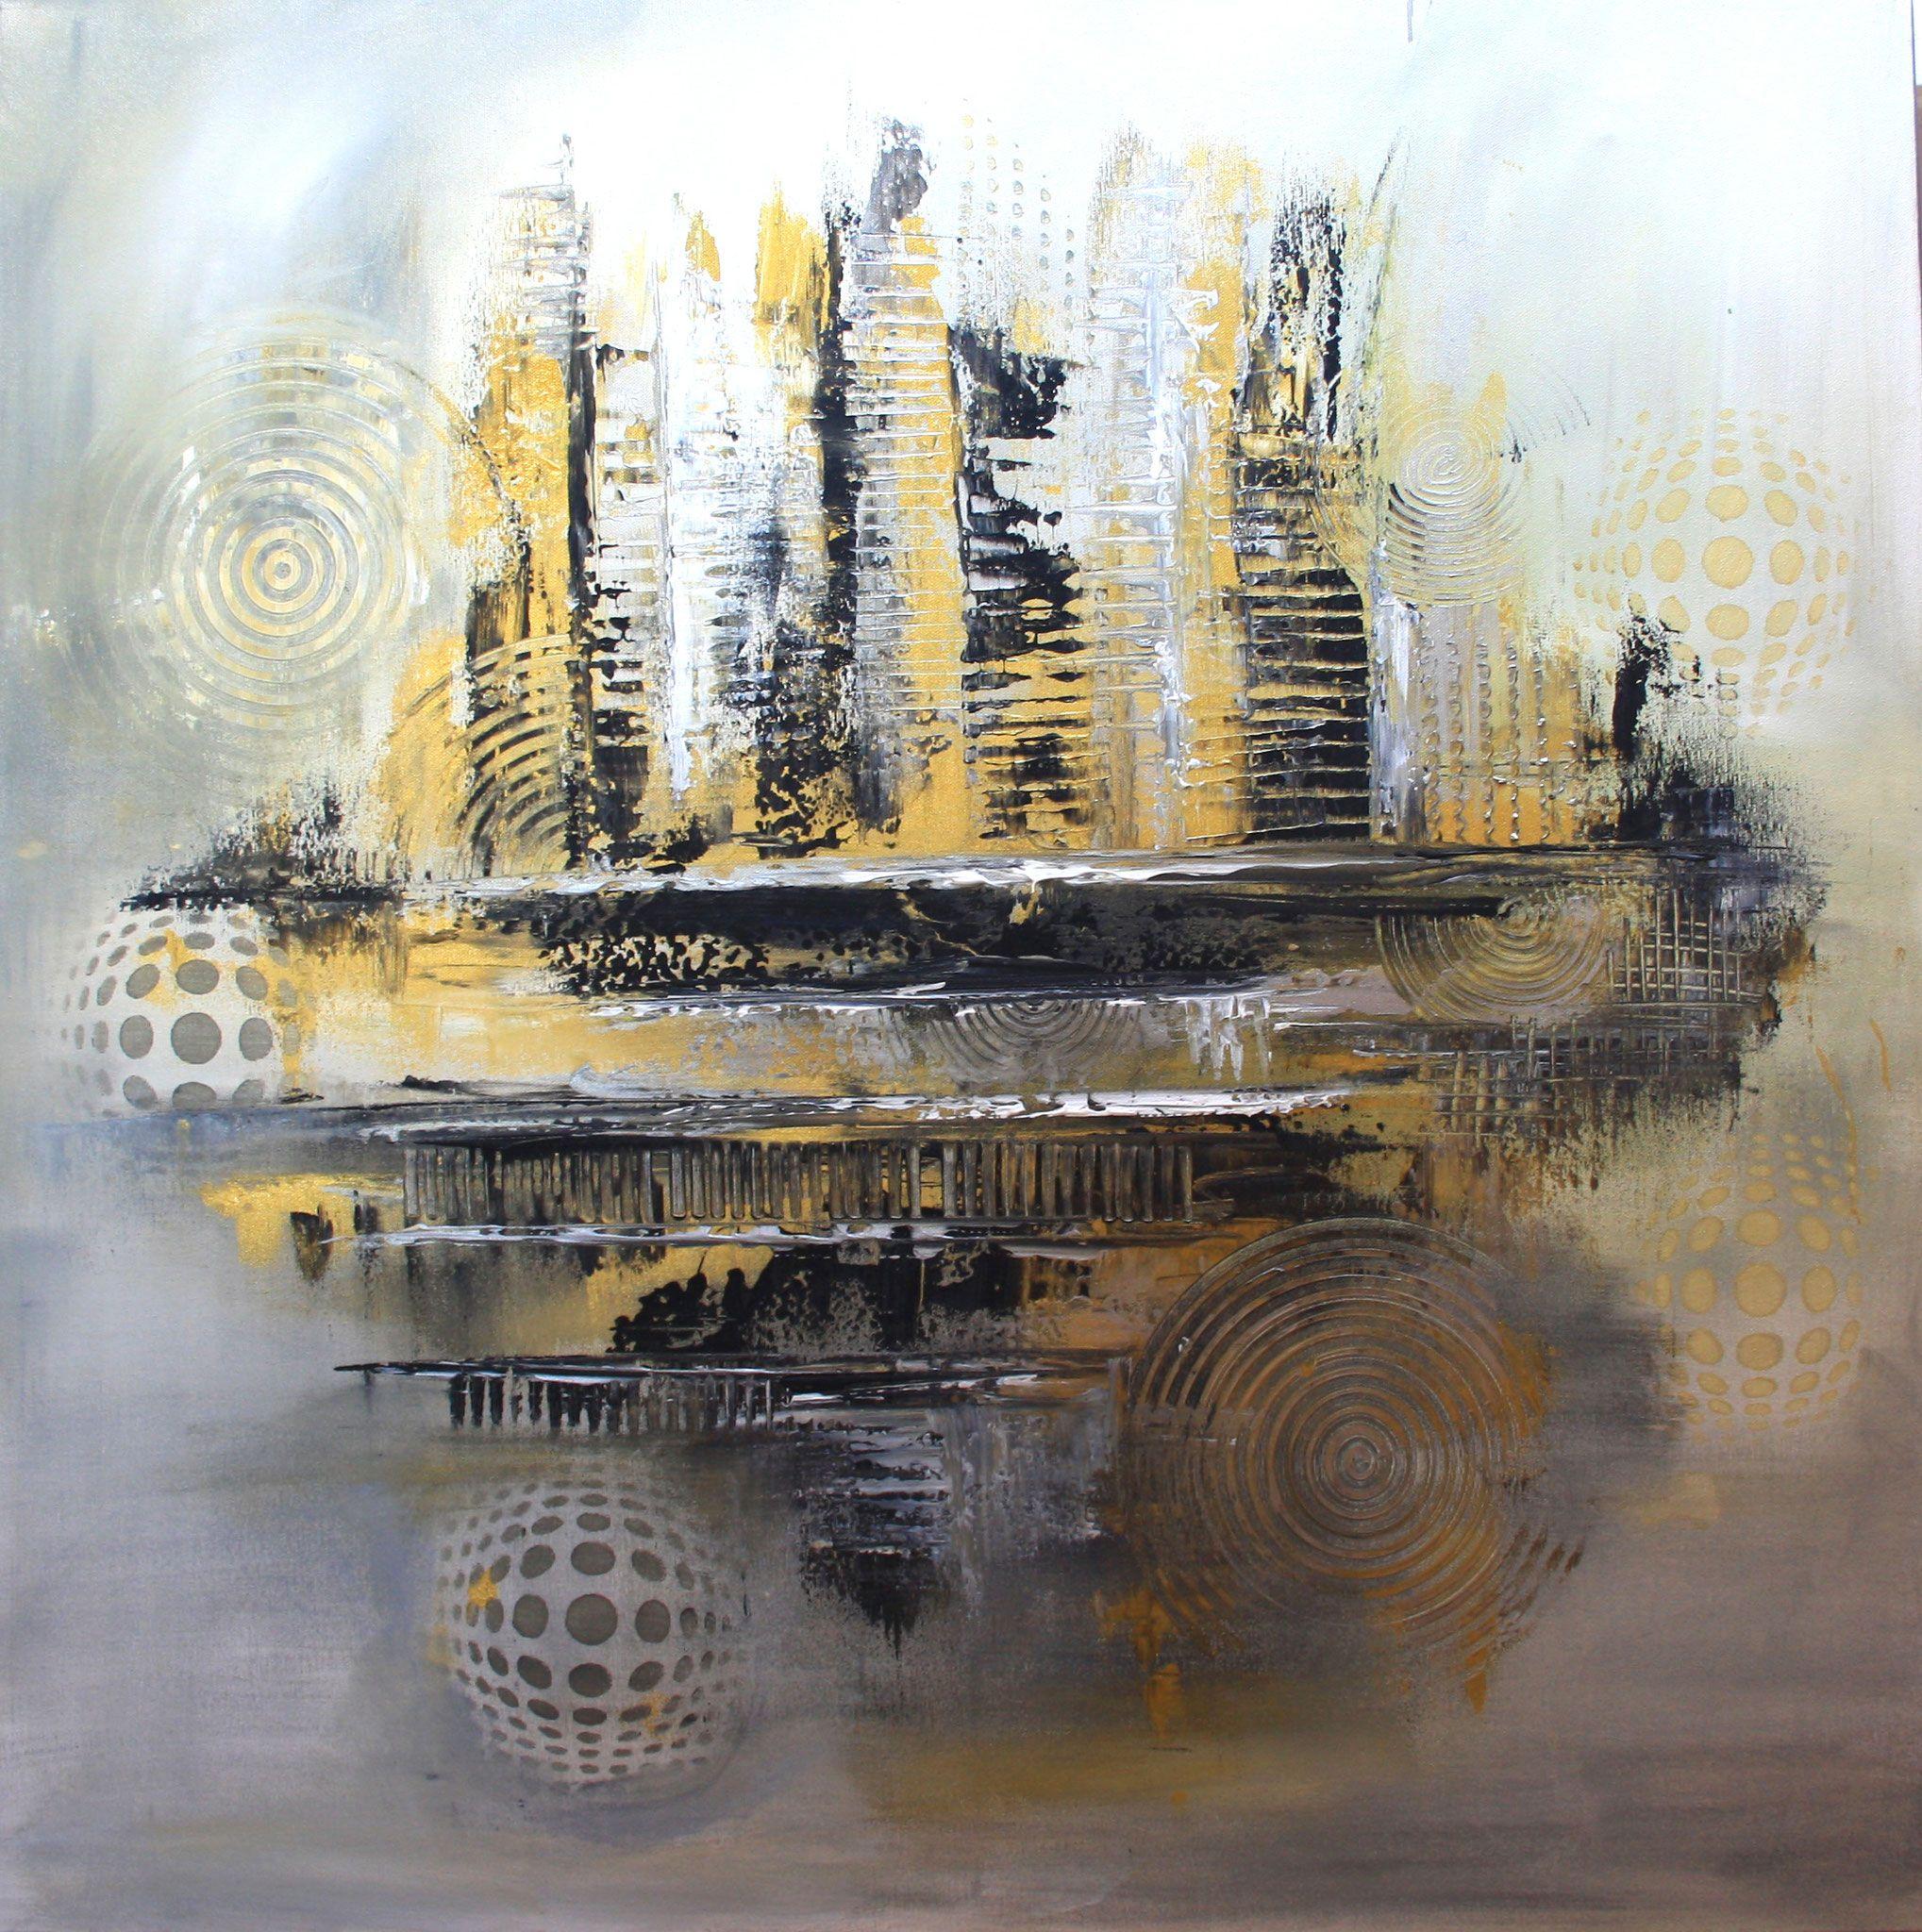 239 verkaufte abstrakte malerei gold silber wandbilder original gemalde kunst kunstwerke acrylmalerei abstrakt gemälde berge körper